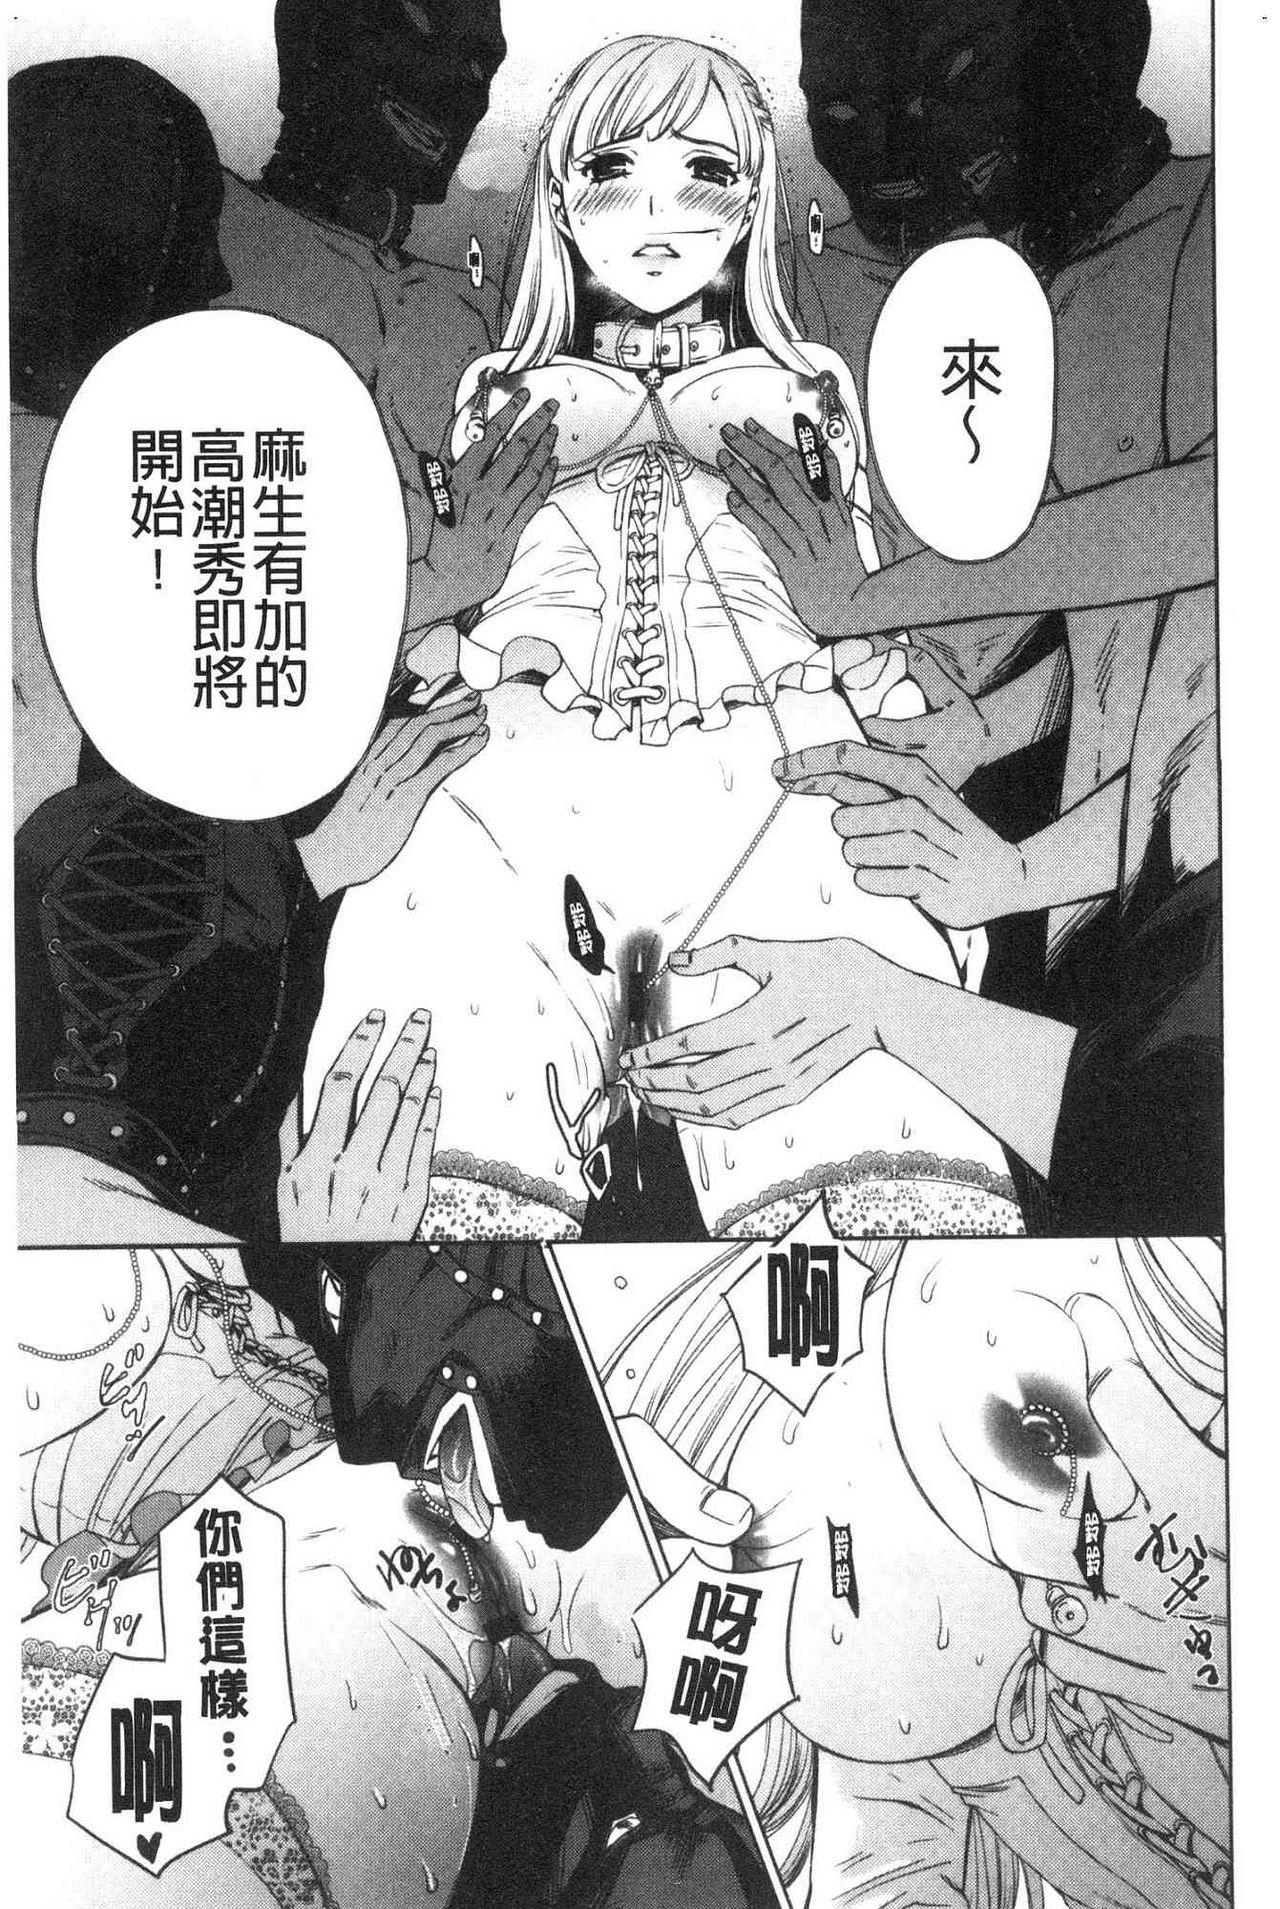 [Gotoh Akira]  21-ji no Onna ~Camera no Mae no Mesuinu~ 2 | 21時之女 ~鏡頭前的牝犬~ 2 [Chinese] 172